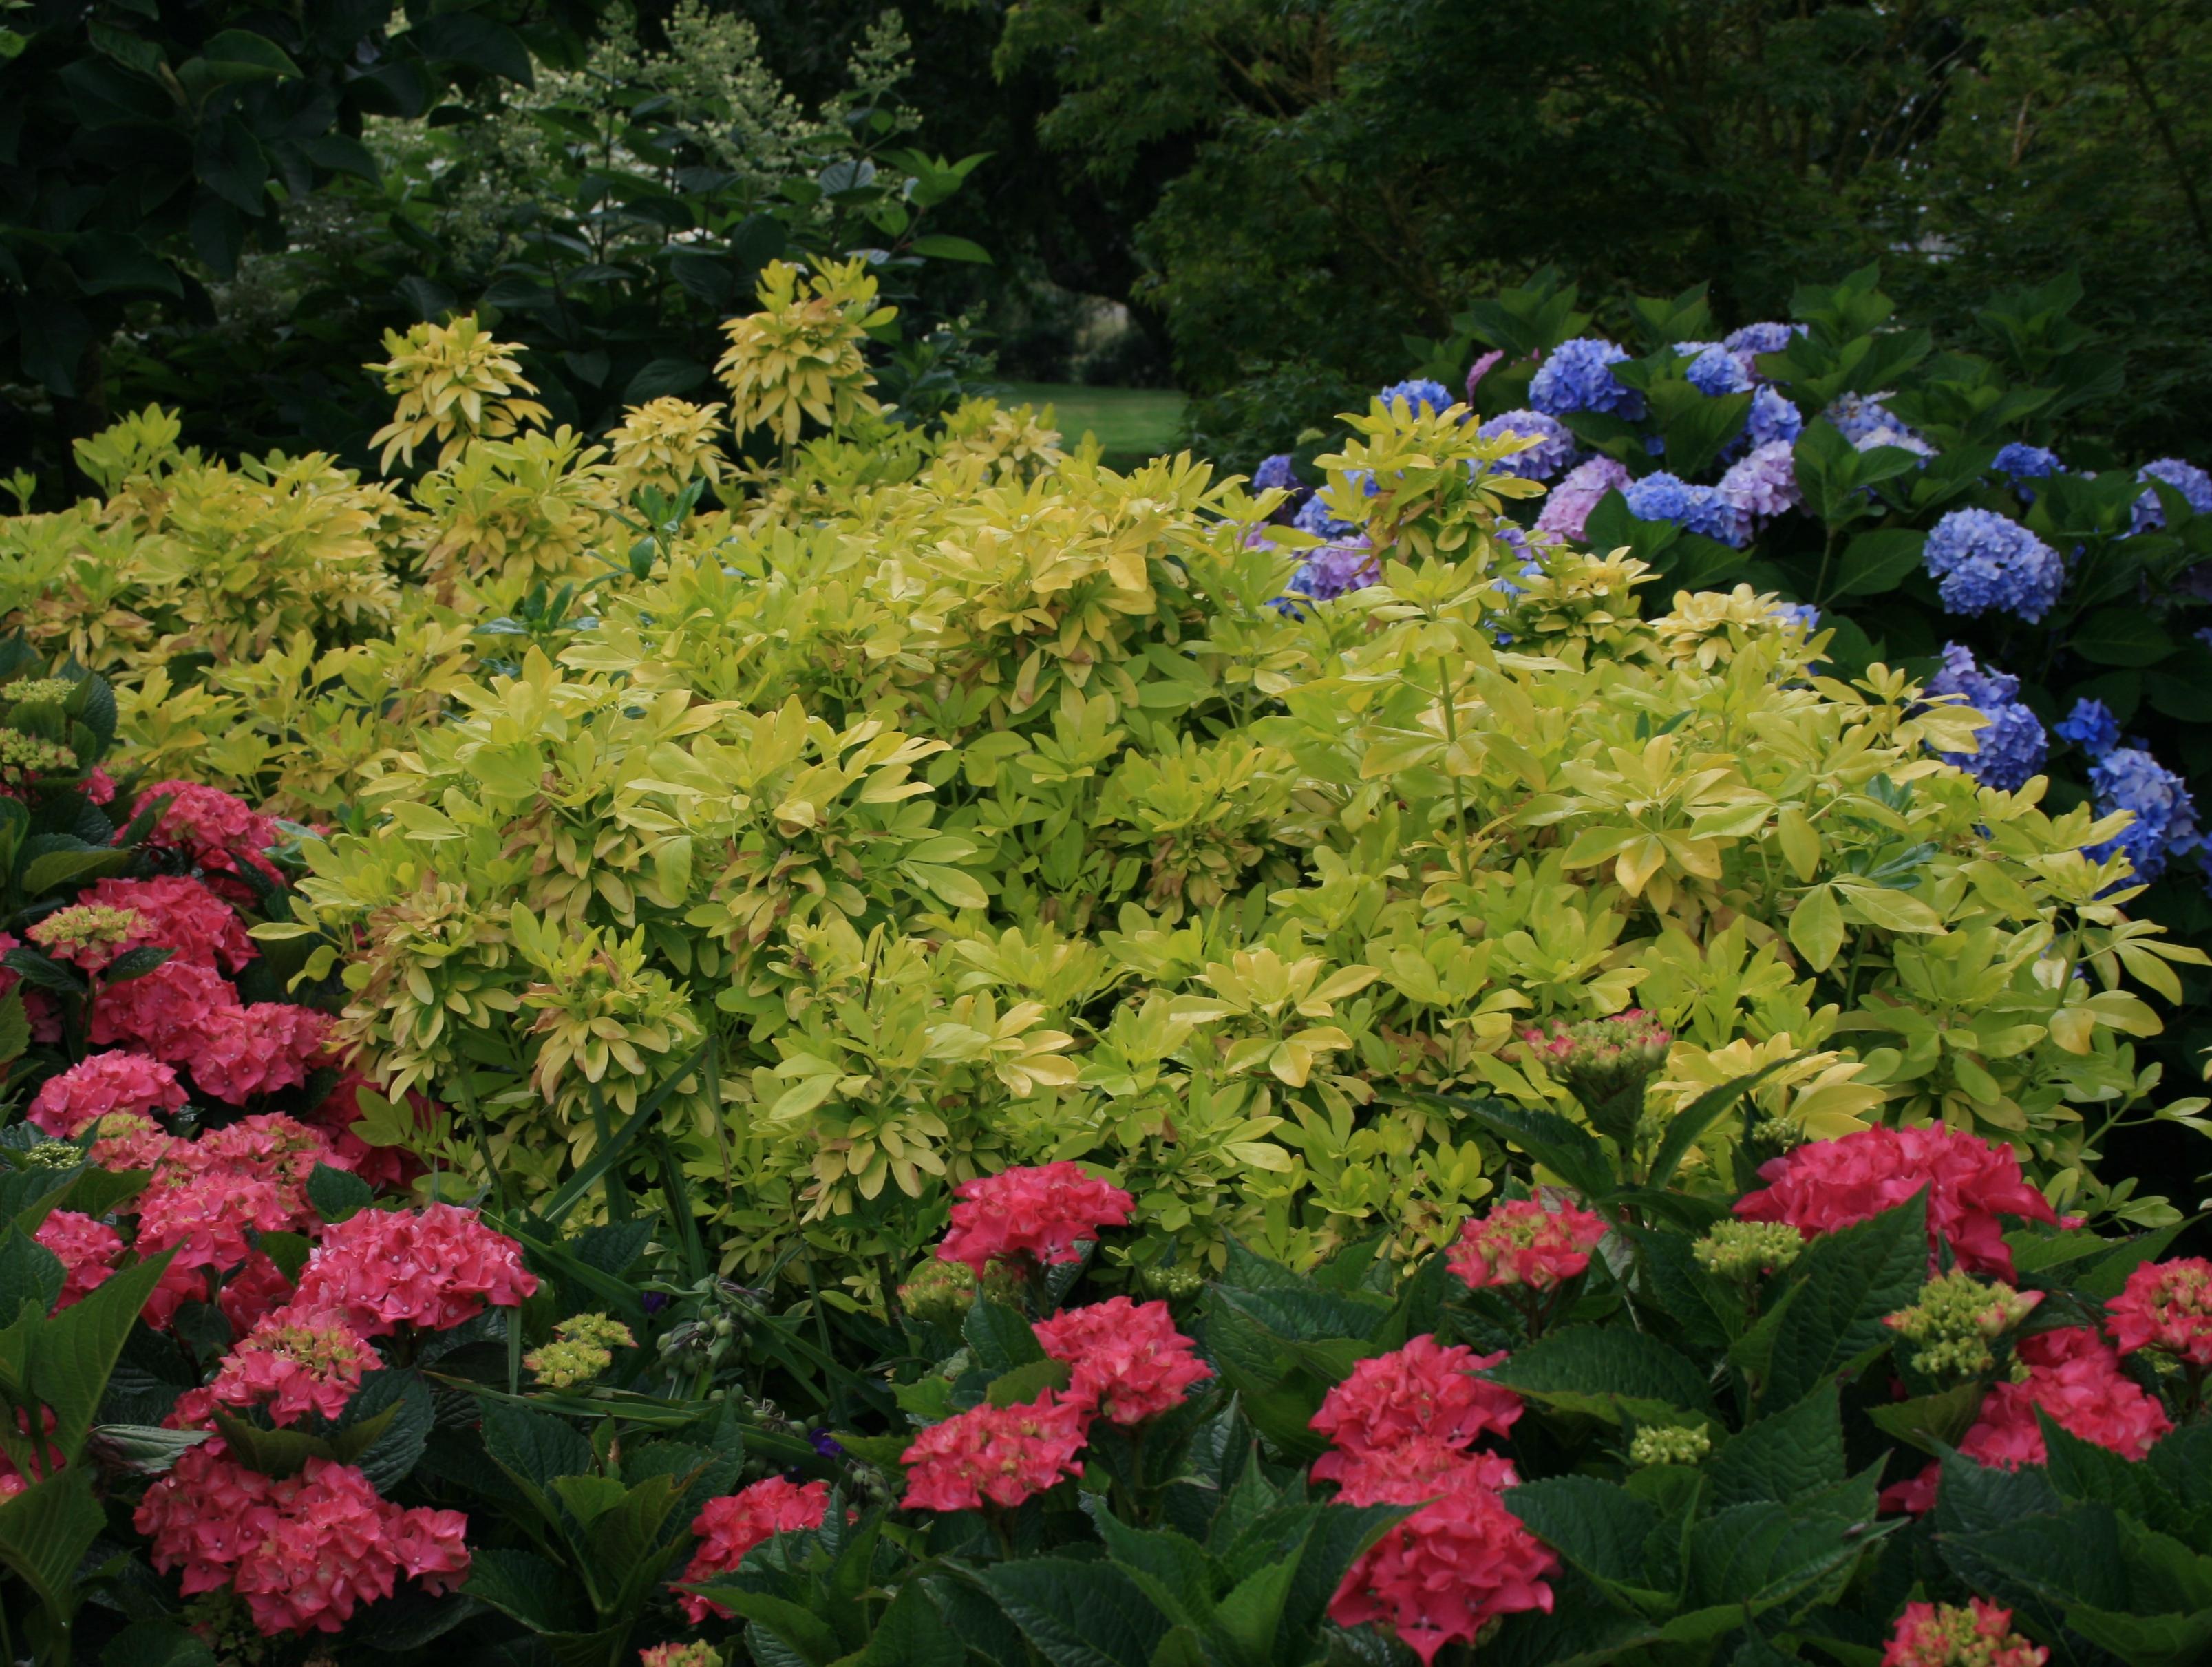 3 conseils pour r ussir son accueil au jardin jardinier for Jardinier conseil